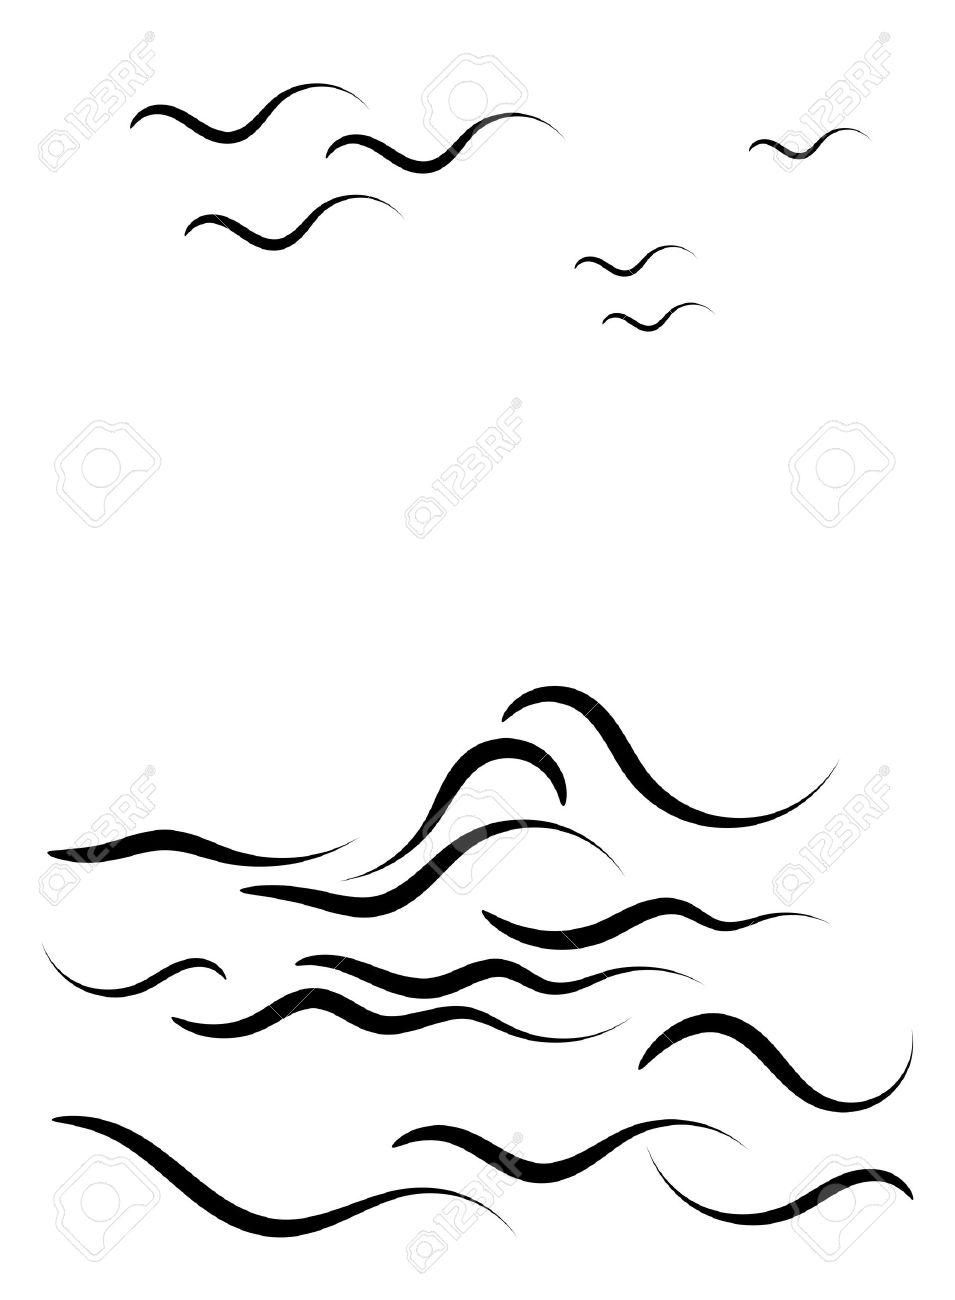 Ocean Clipart Black And White. Beautiful-Ocean Clipart Black And White. Beautiful black silhouette of .-12